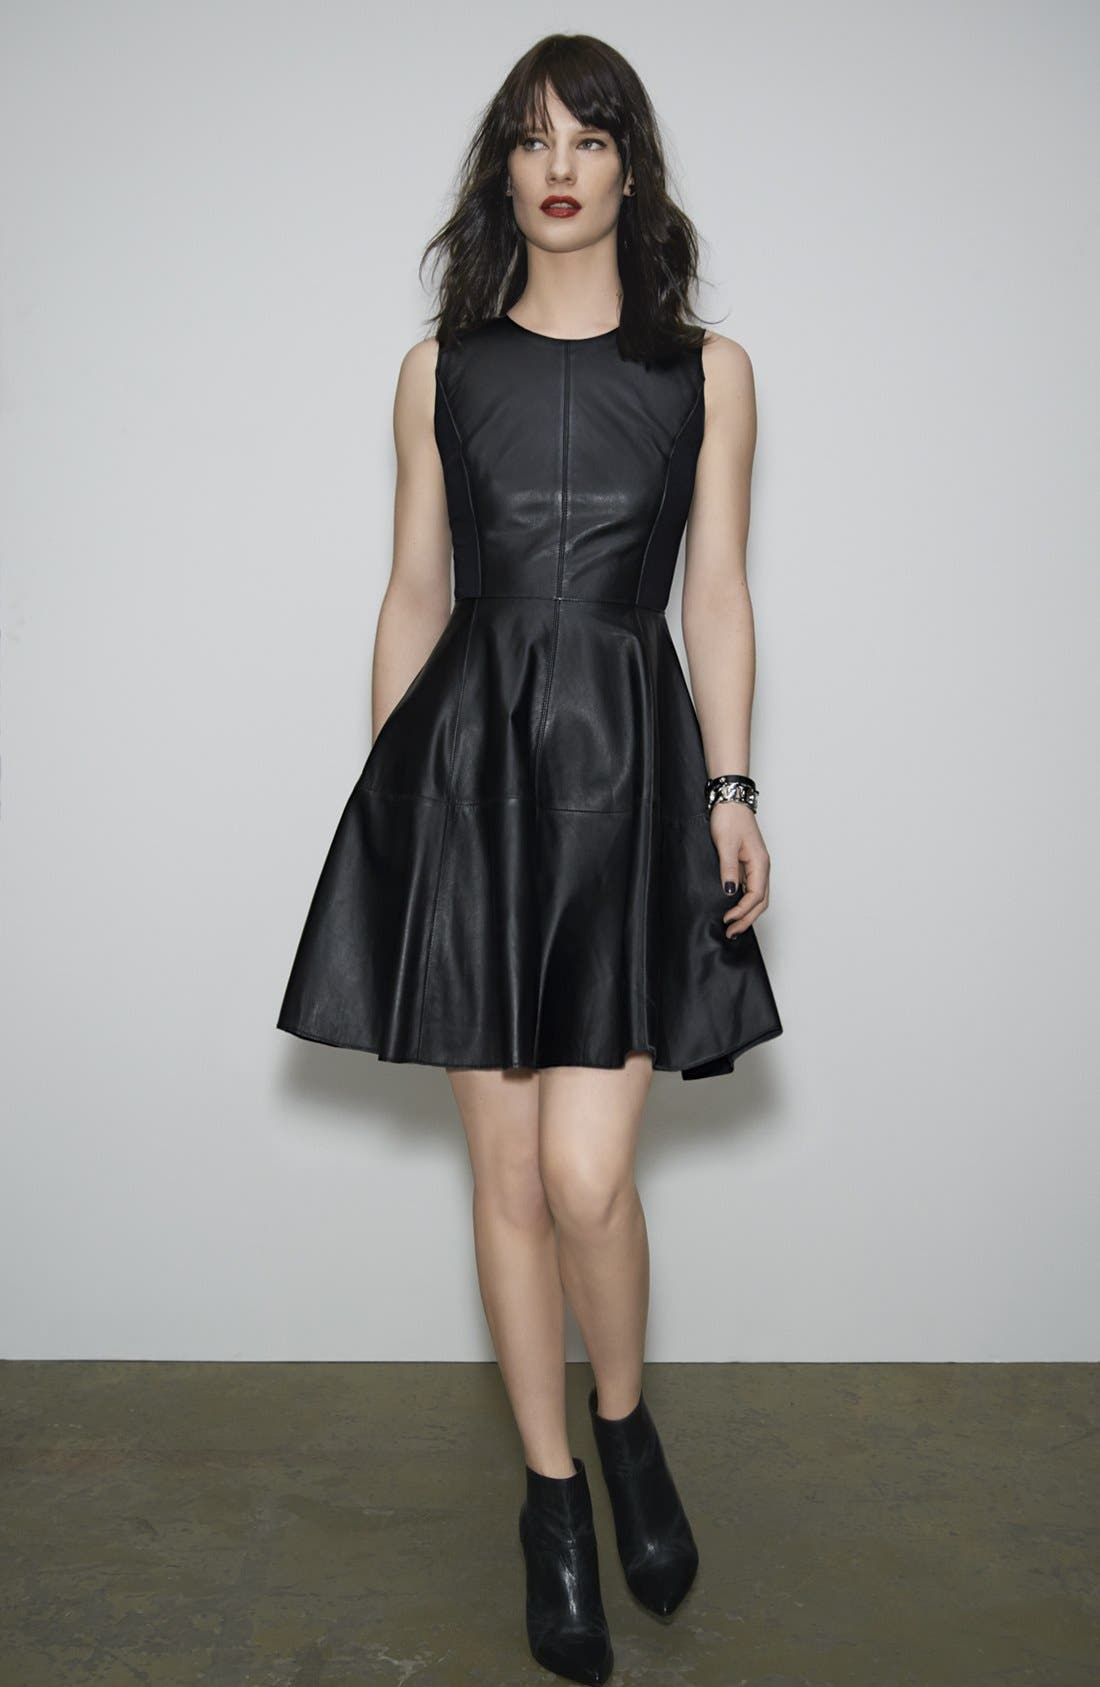 Main Image - Halogen® Dress & Accessories